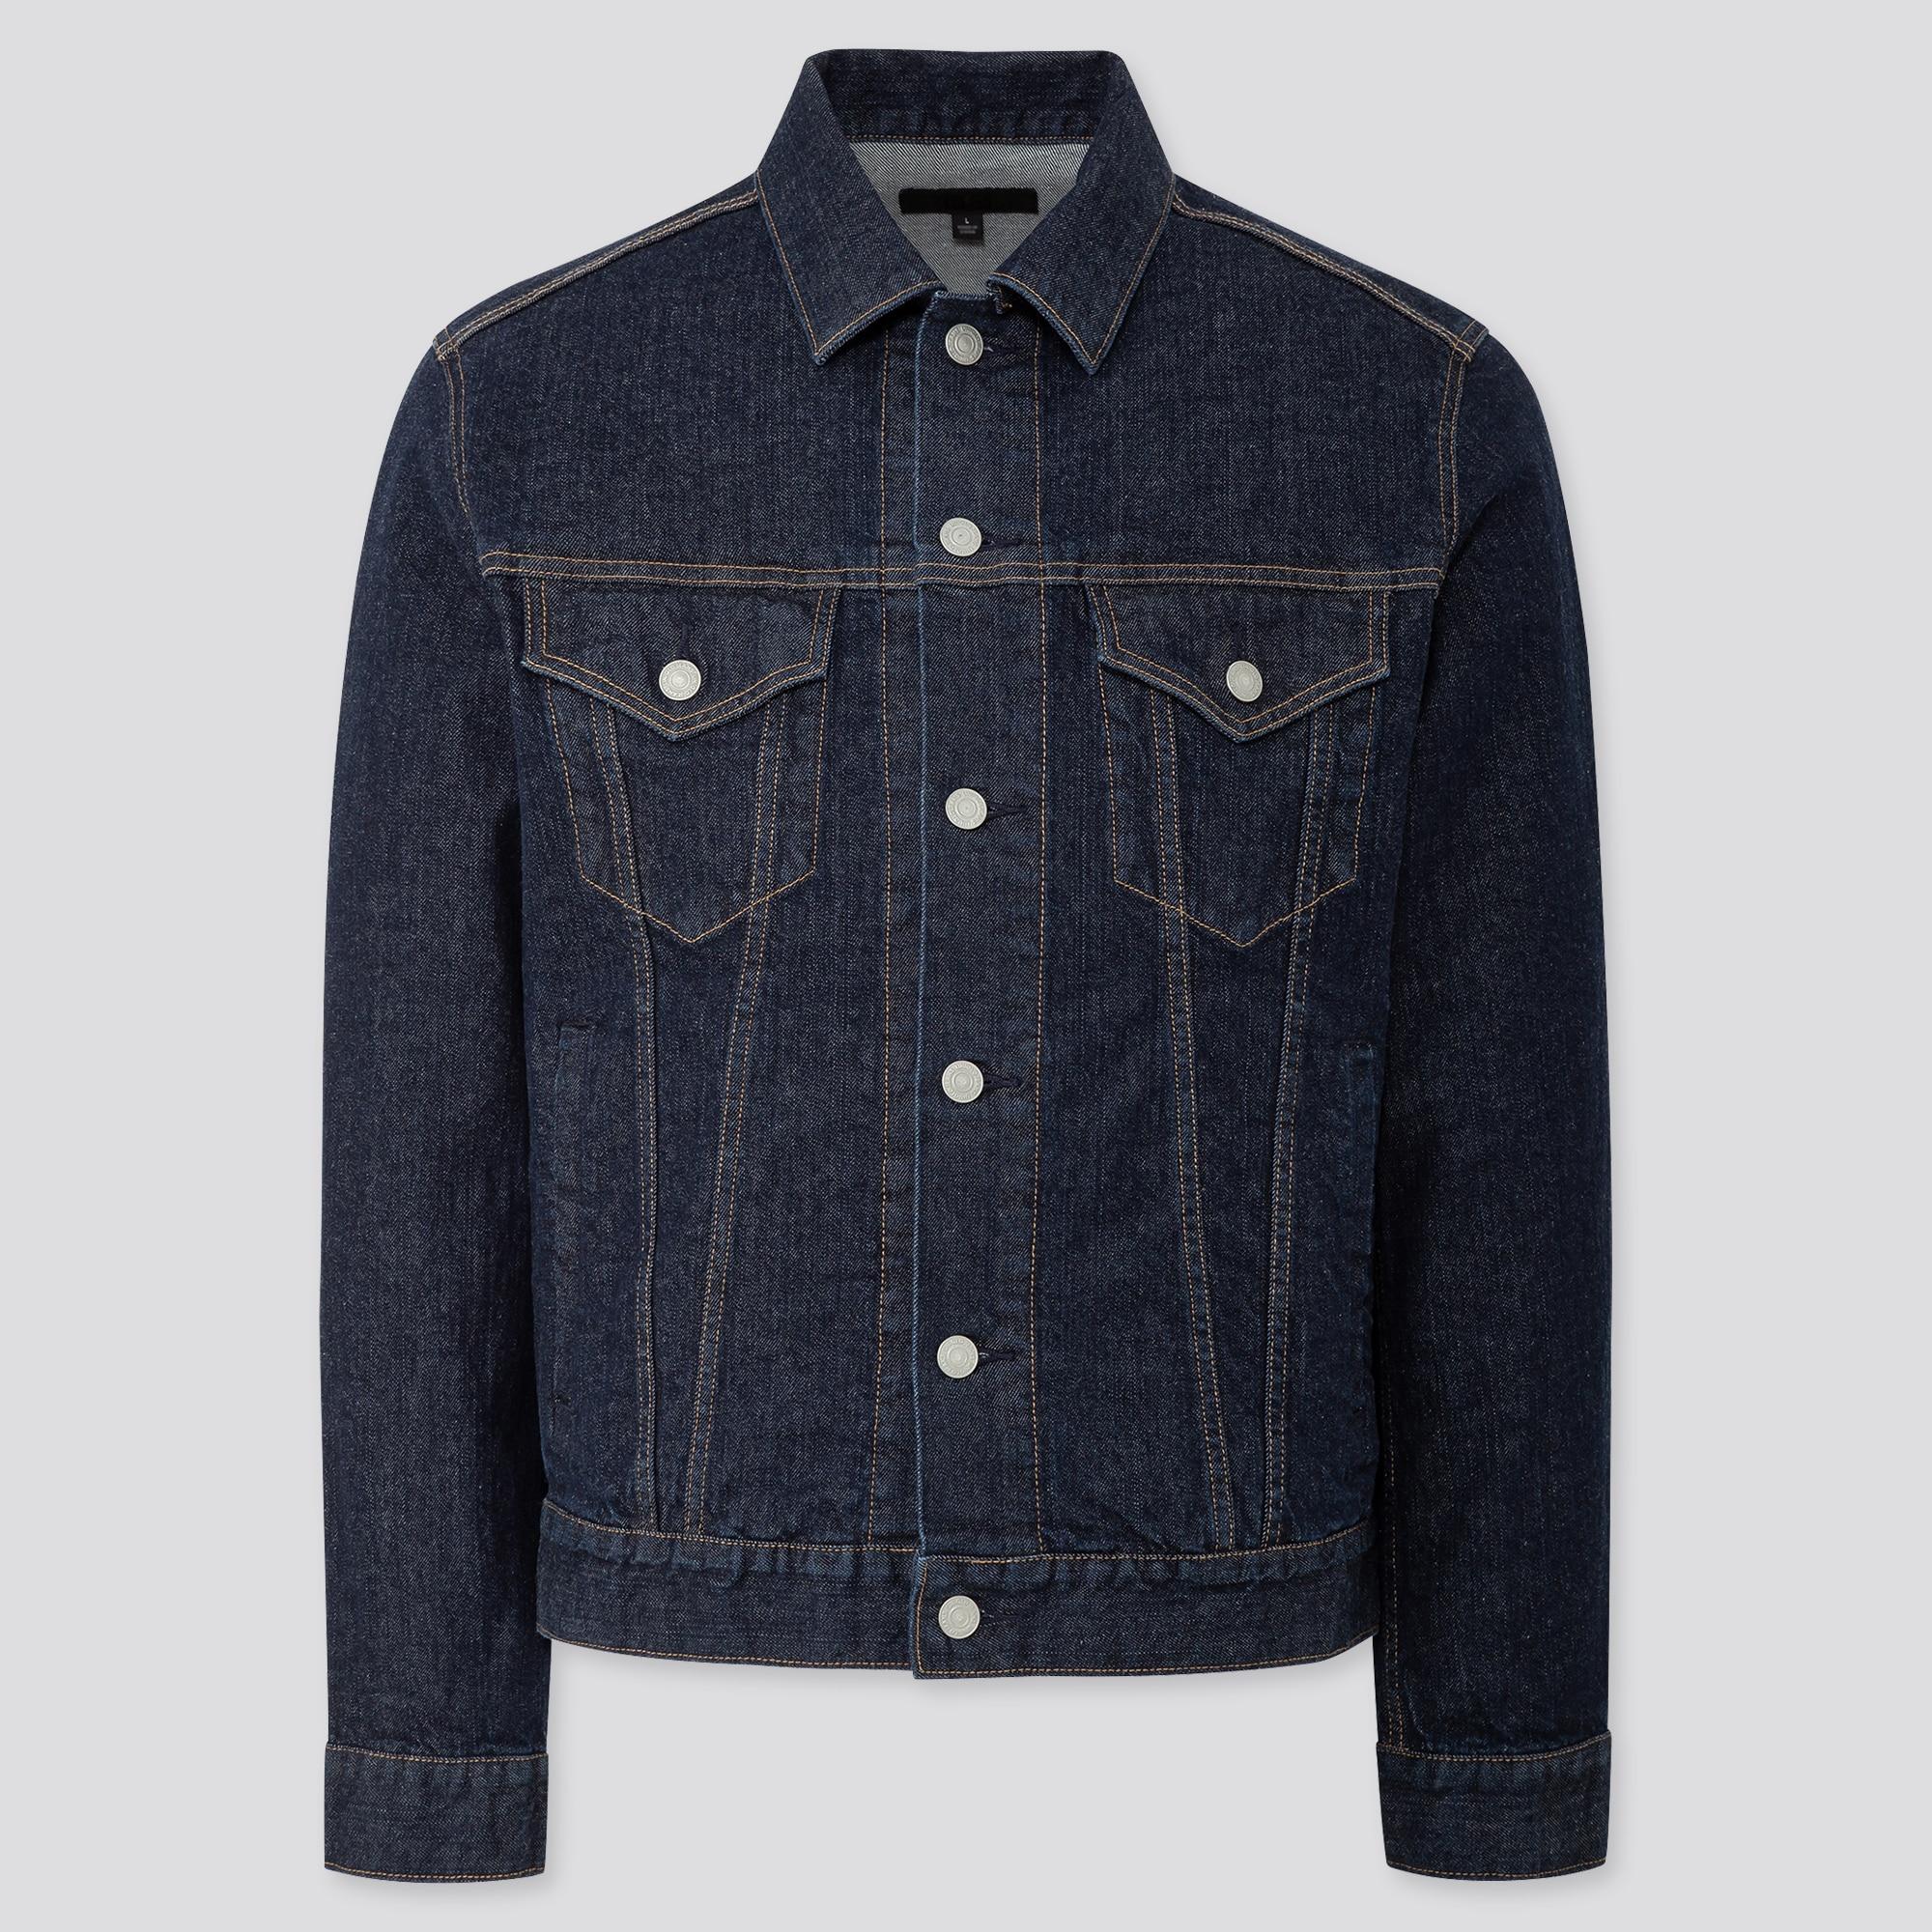 herren jeansjacke 68 70 günstig